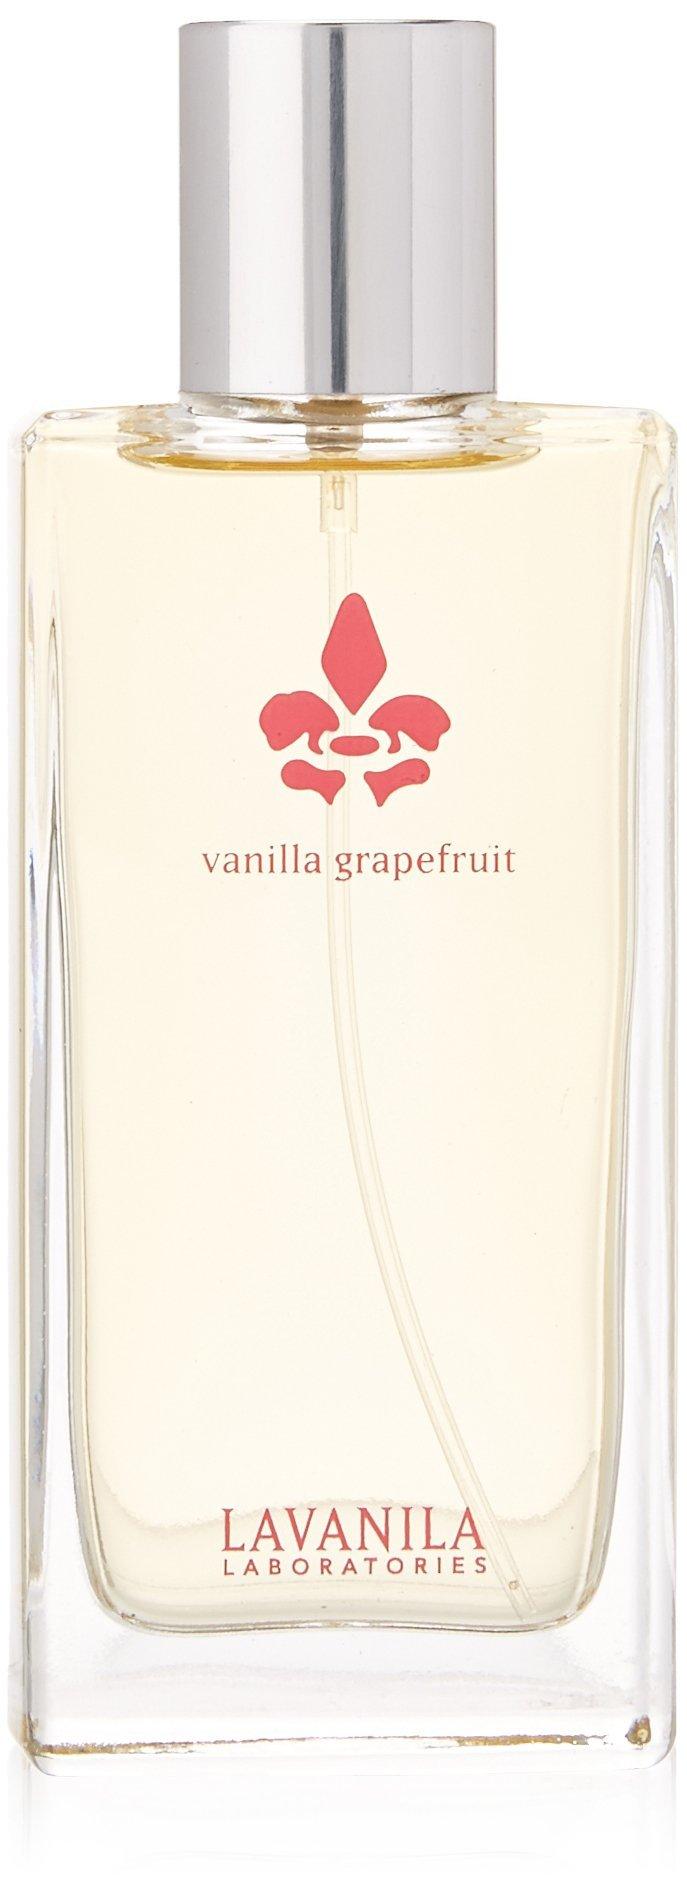 Lavanila The Healthy Fragrance Eau de Toilette, Vanilla Grapefruit, 1.7 Fluid Ounce